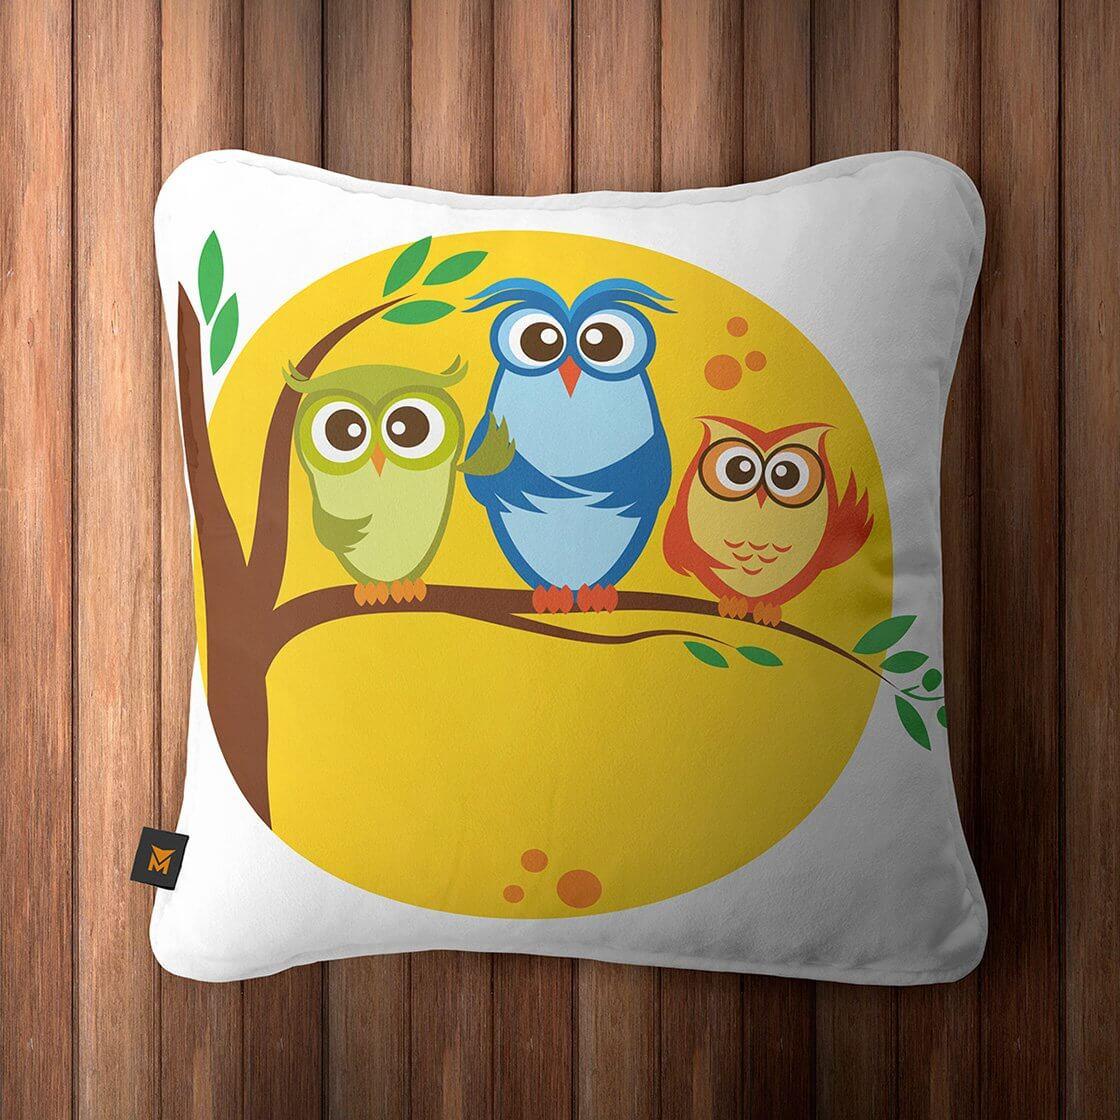 custom merchandise design by Ebtihal